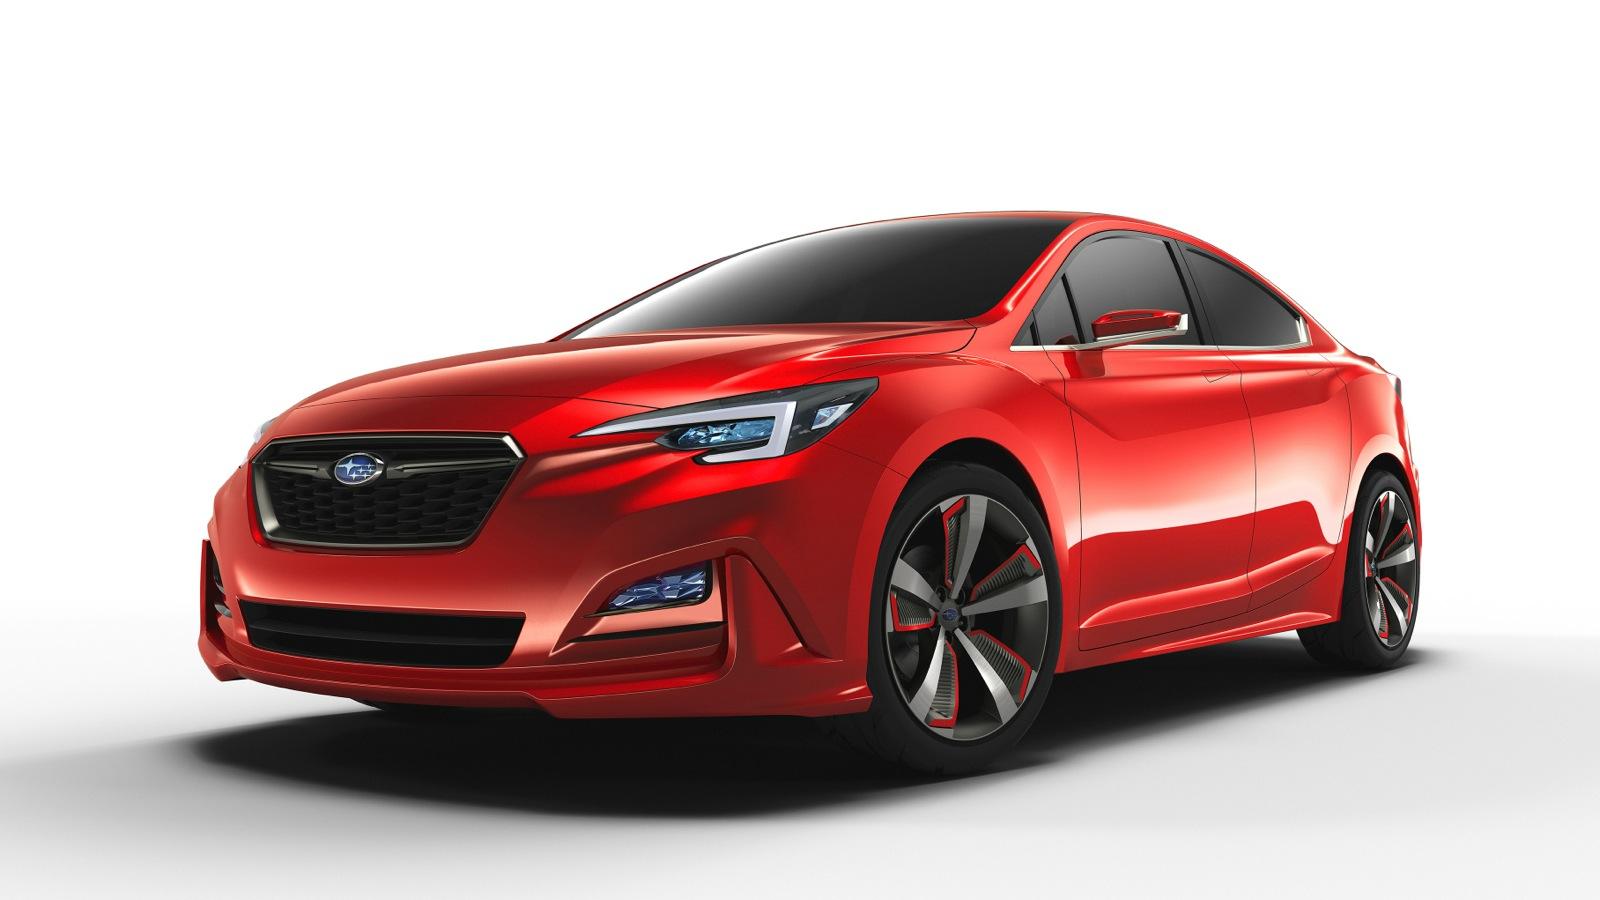 ... Mpg Concept Model Hybrid. on car and driver subaru crosstrek hybrid